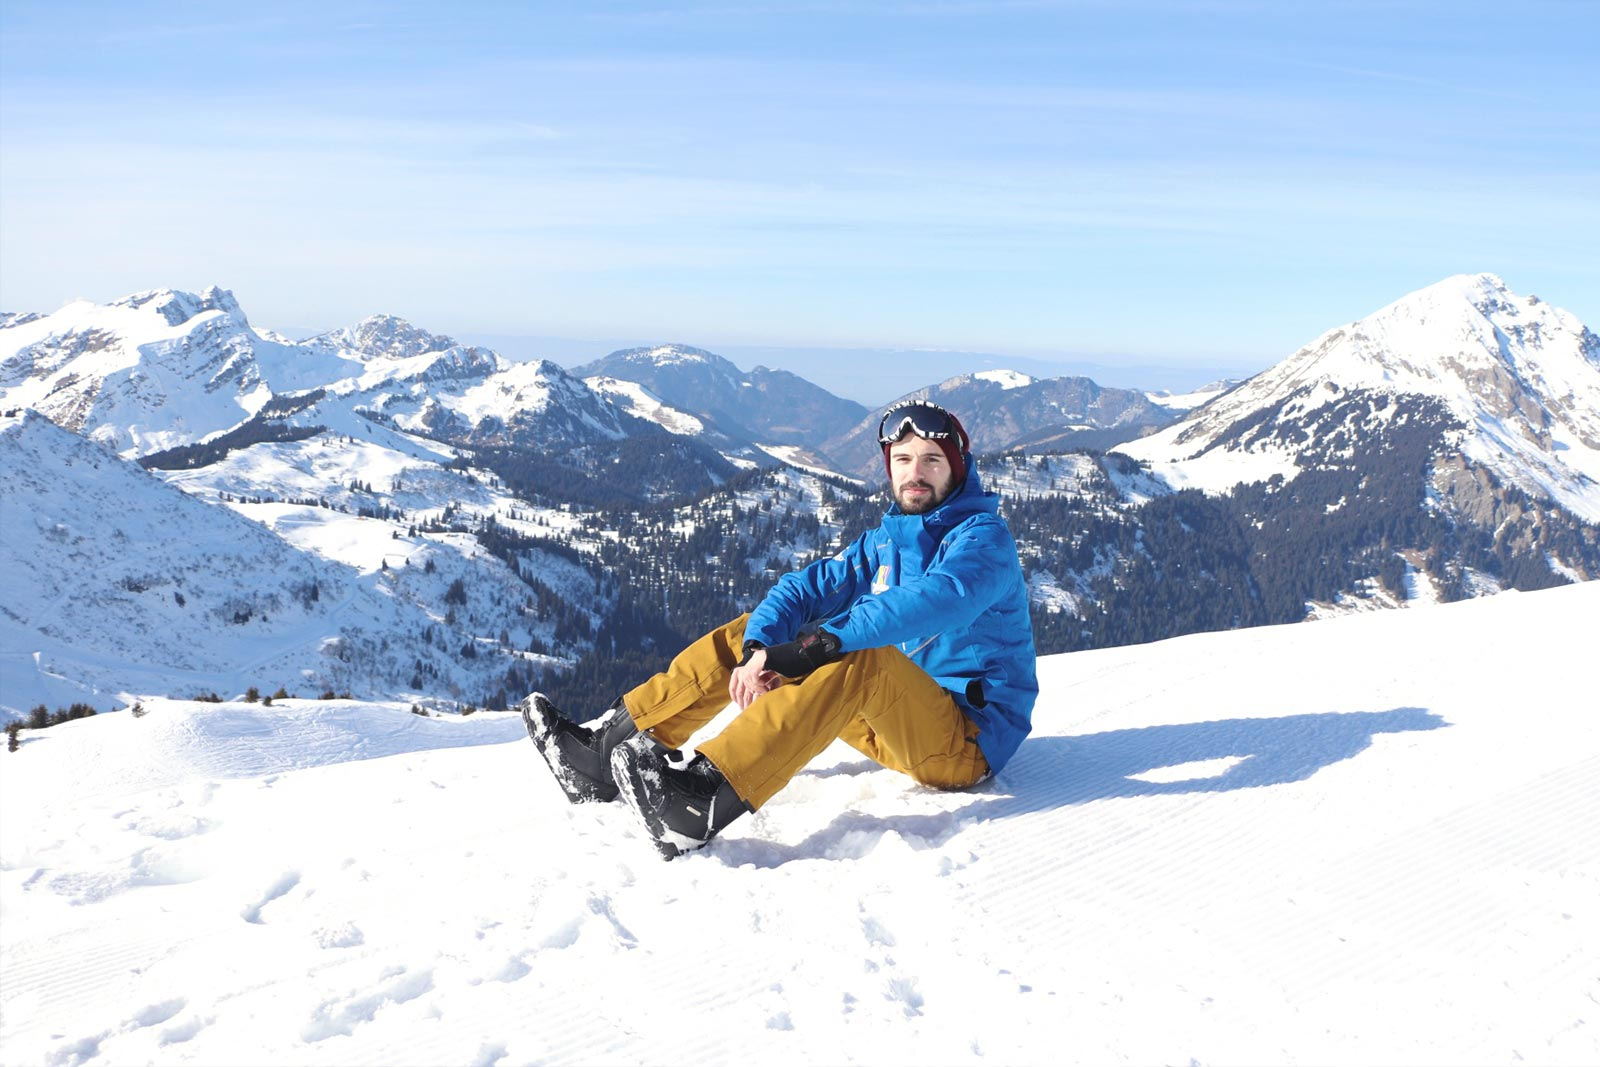 Mode snowboard